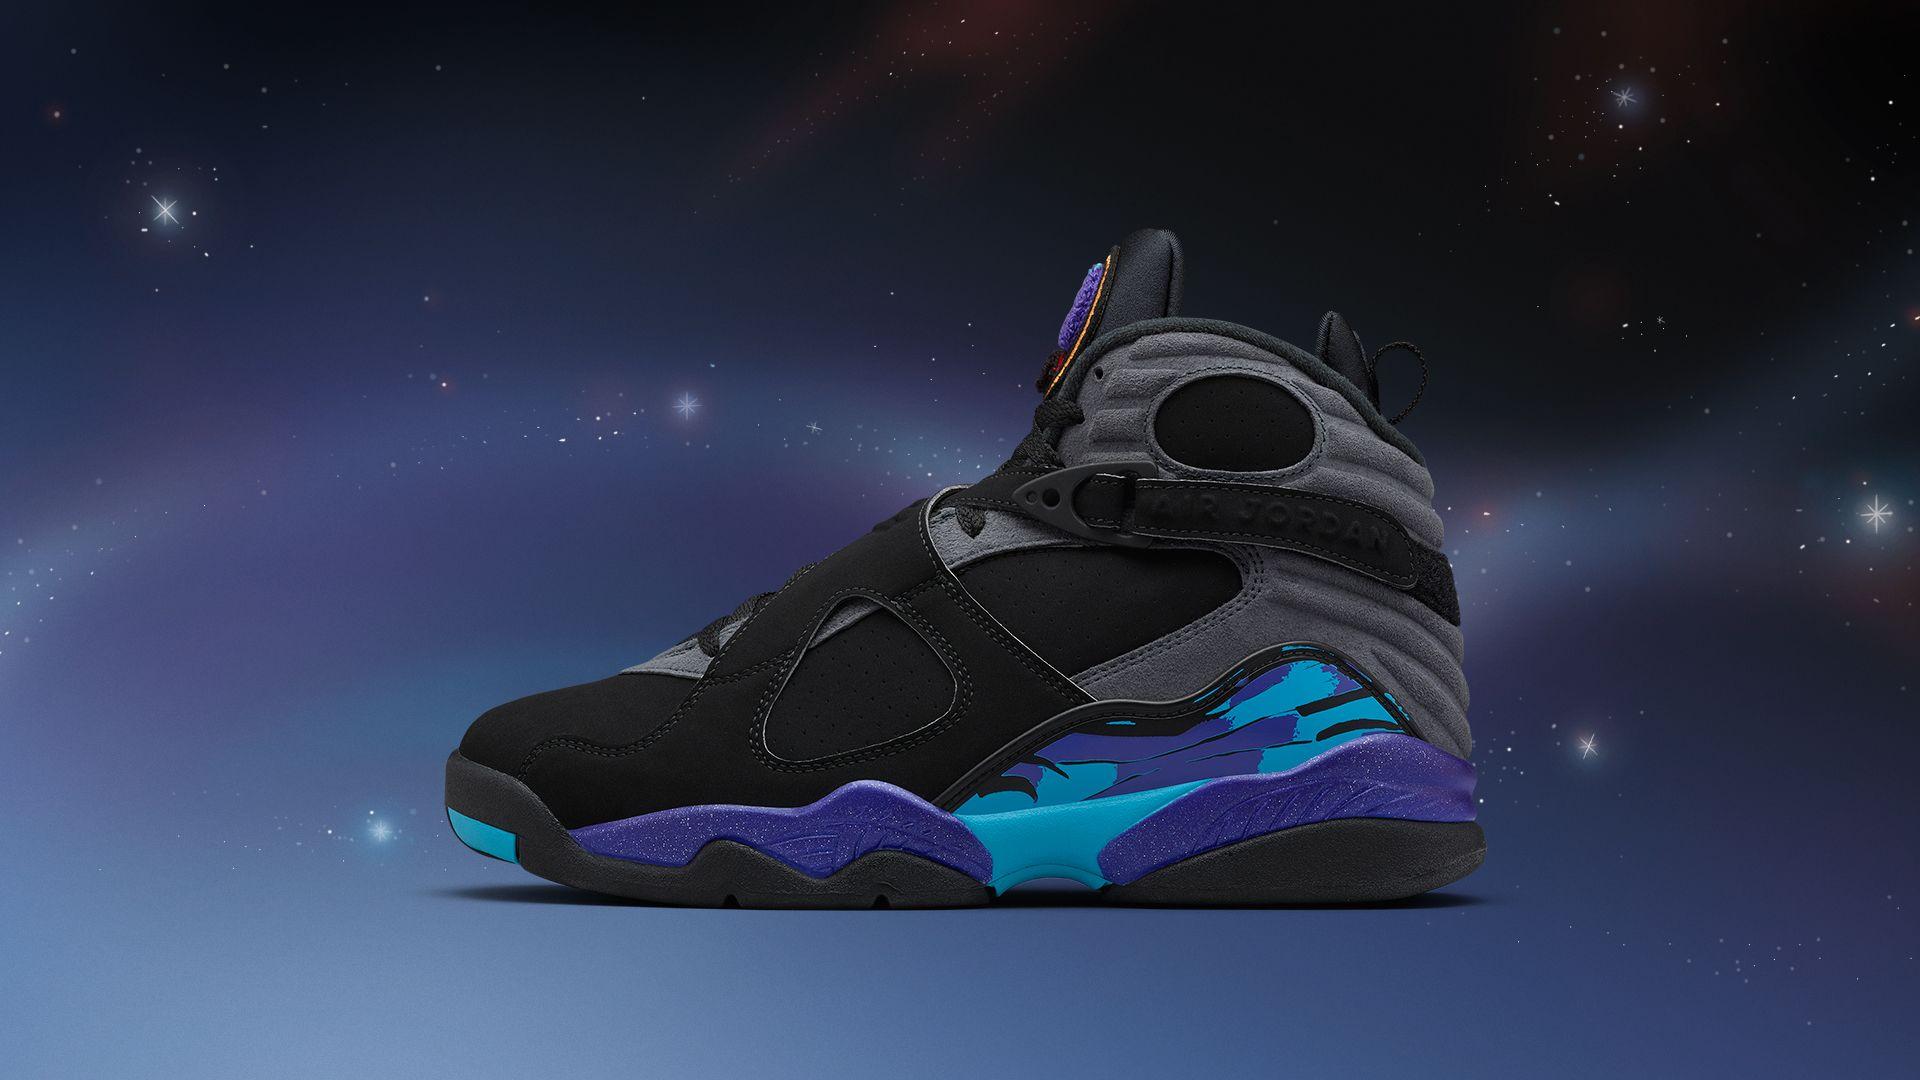 watch 8ec06 f8fe2 Air Jordan 8 Retro 'Aqua' Release Date. Nike+ SNKRS